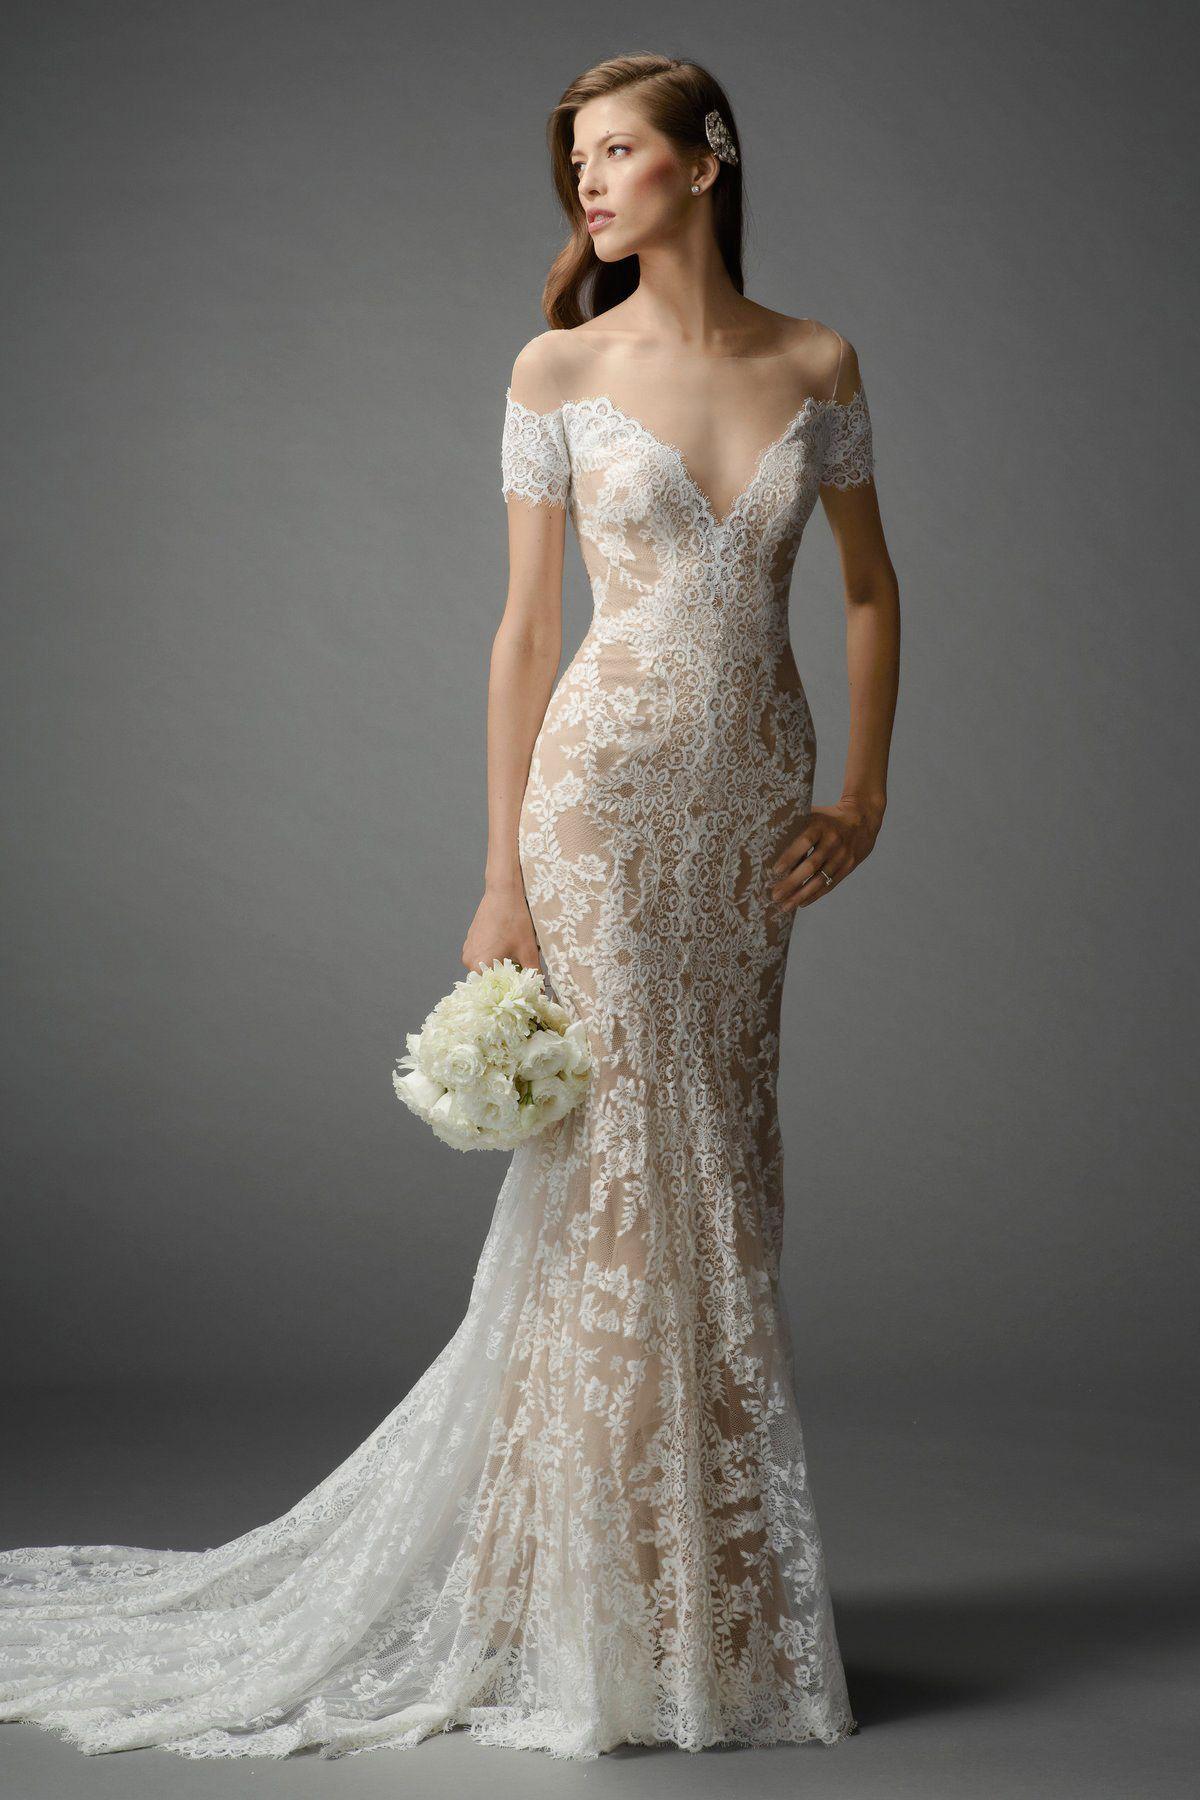 Watters Brides Mila Gown w/ Bronze lining | Inspiração usar | Pinterest